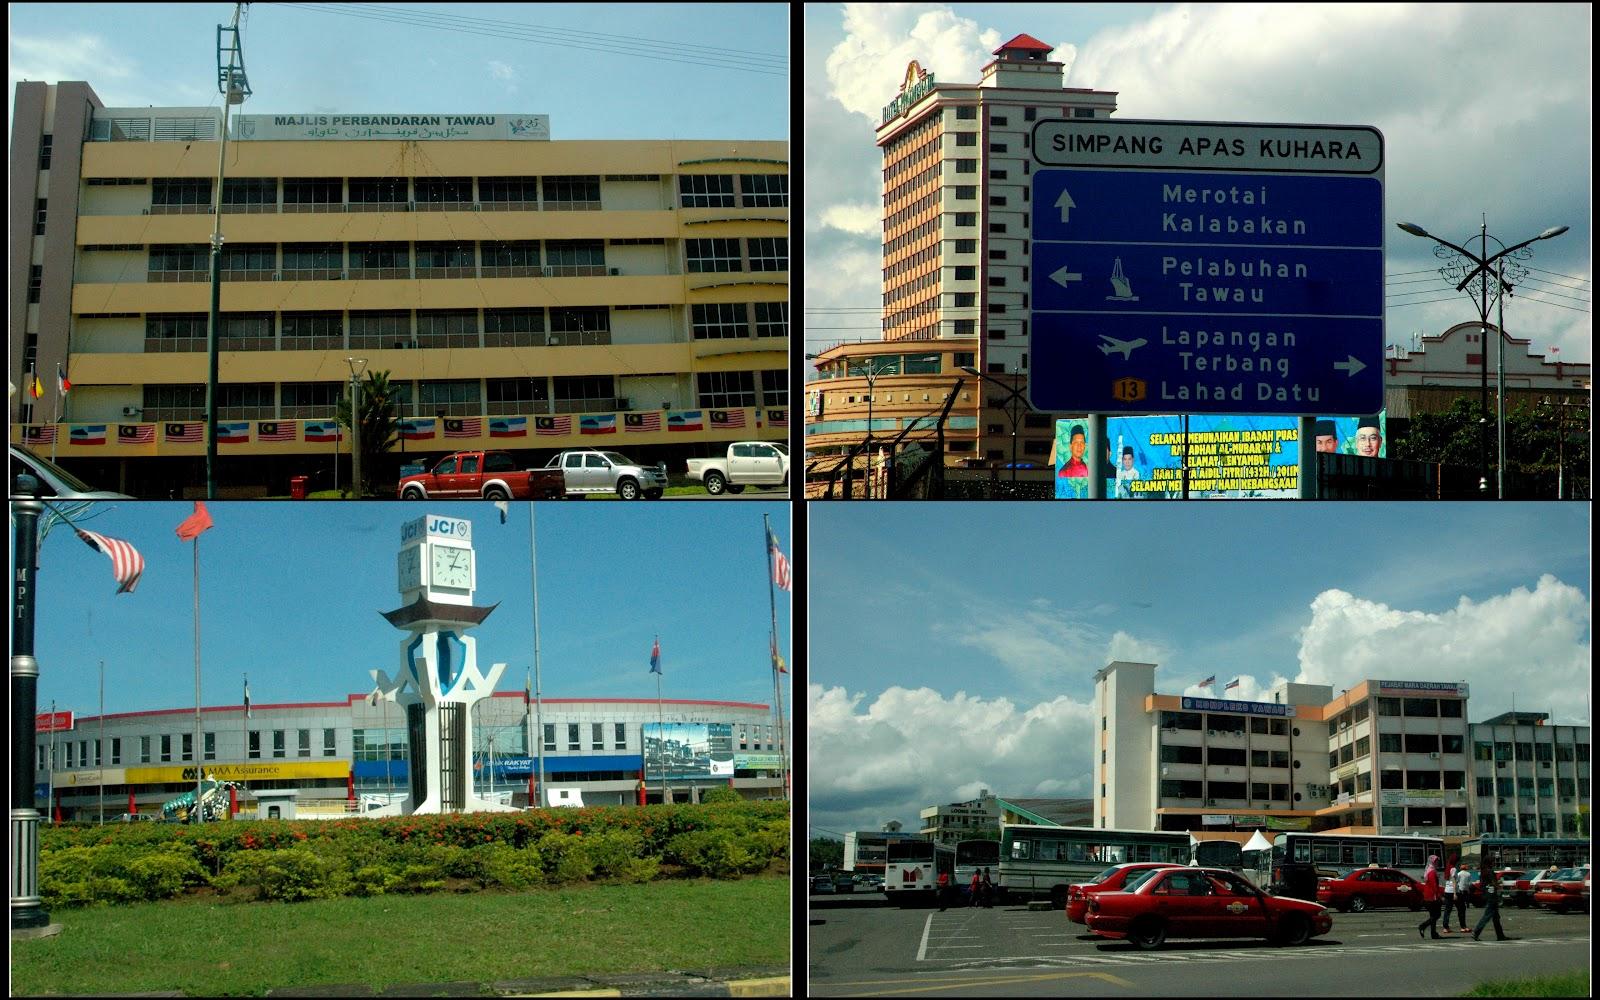 Tawau Malaysia  city photos : Ronda Ronda Sekitar Pusat Bandar Tawau, Sabah | ! LUNA LANUN !